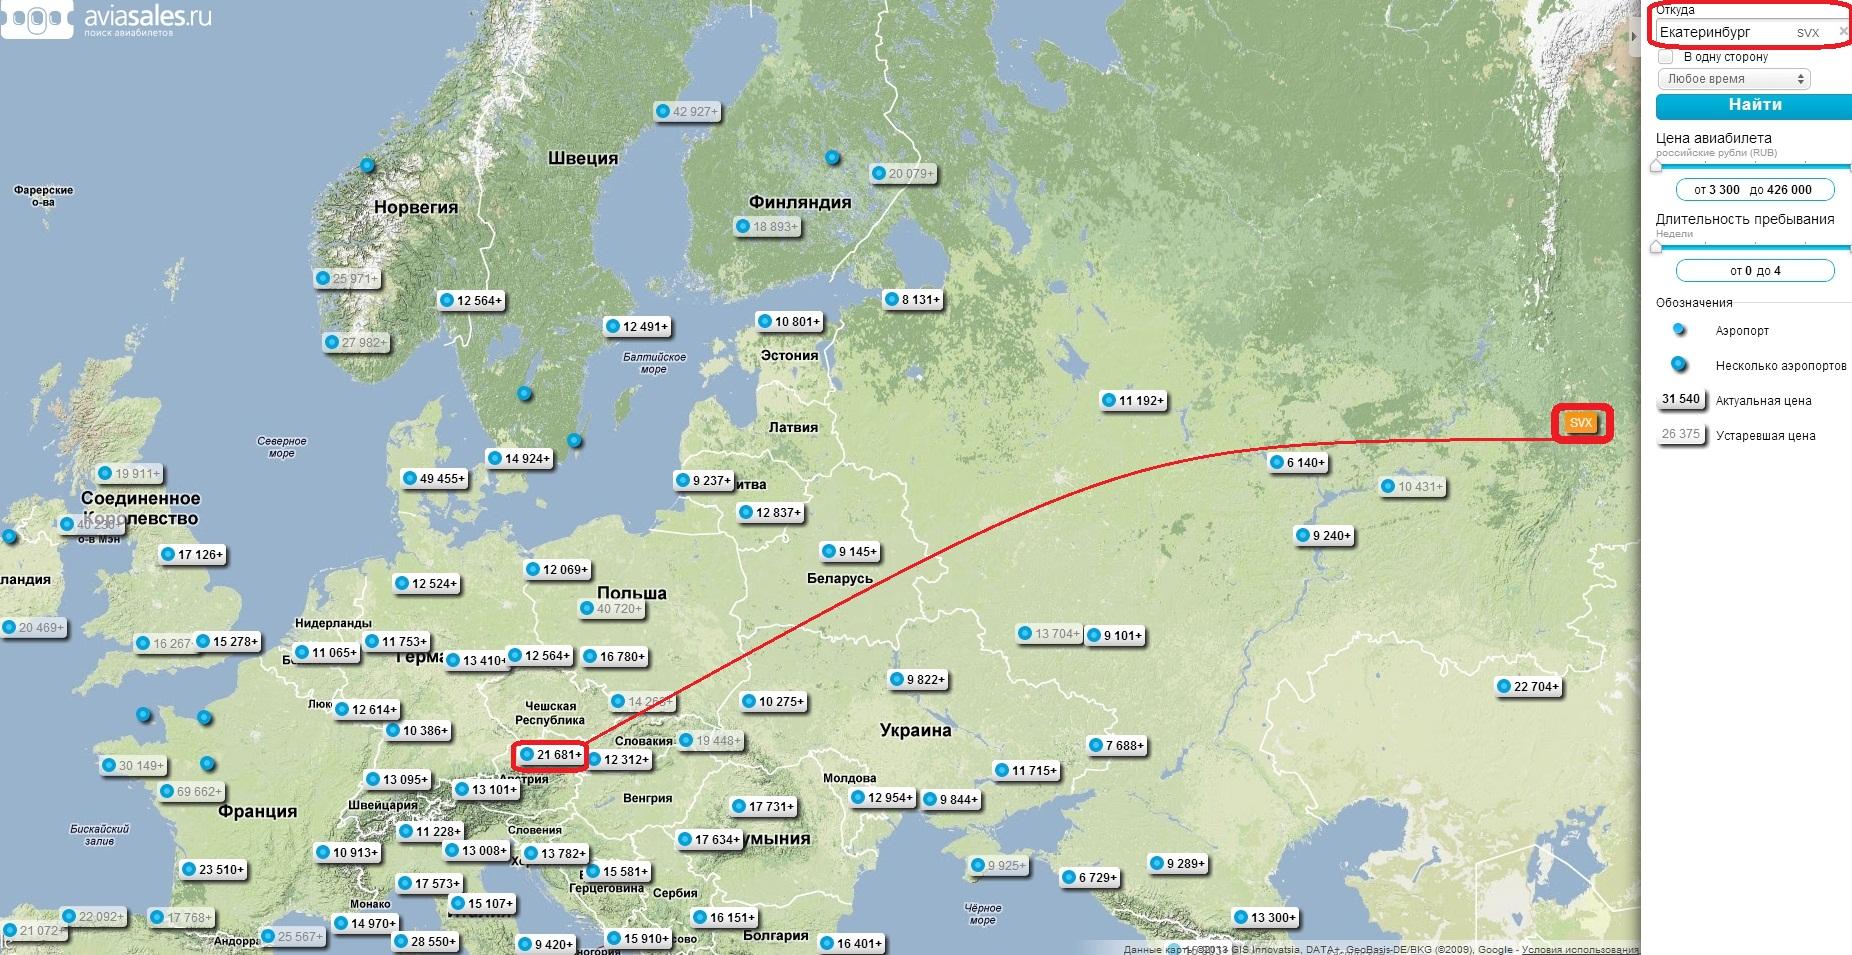 Карта цен на авиабилеты Екатеринбург-Европа